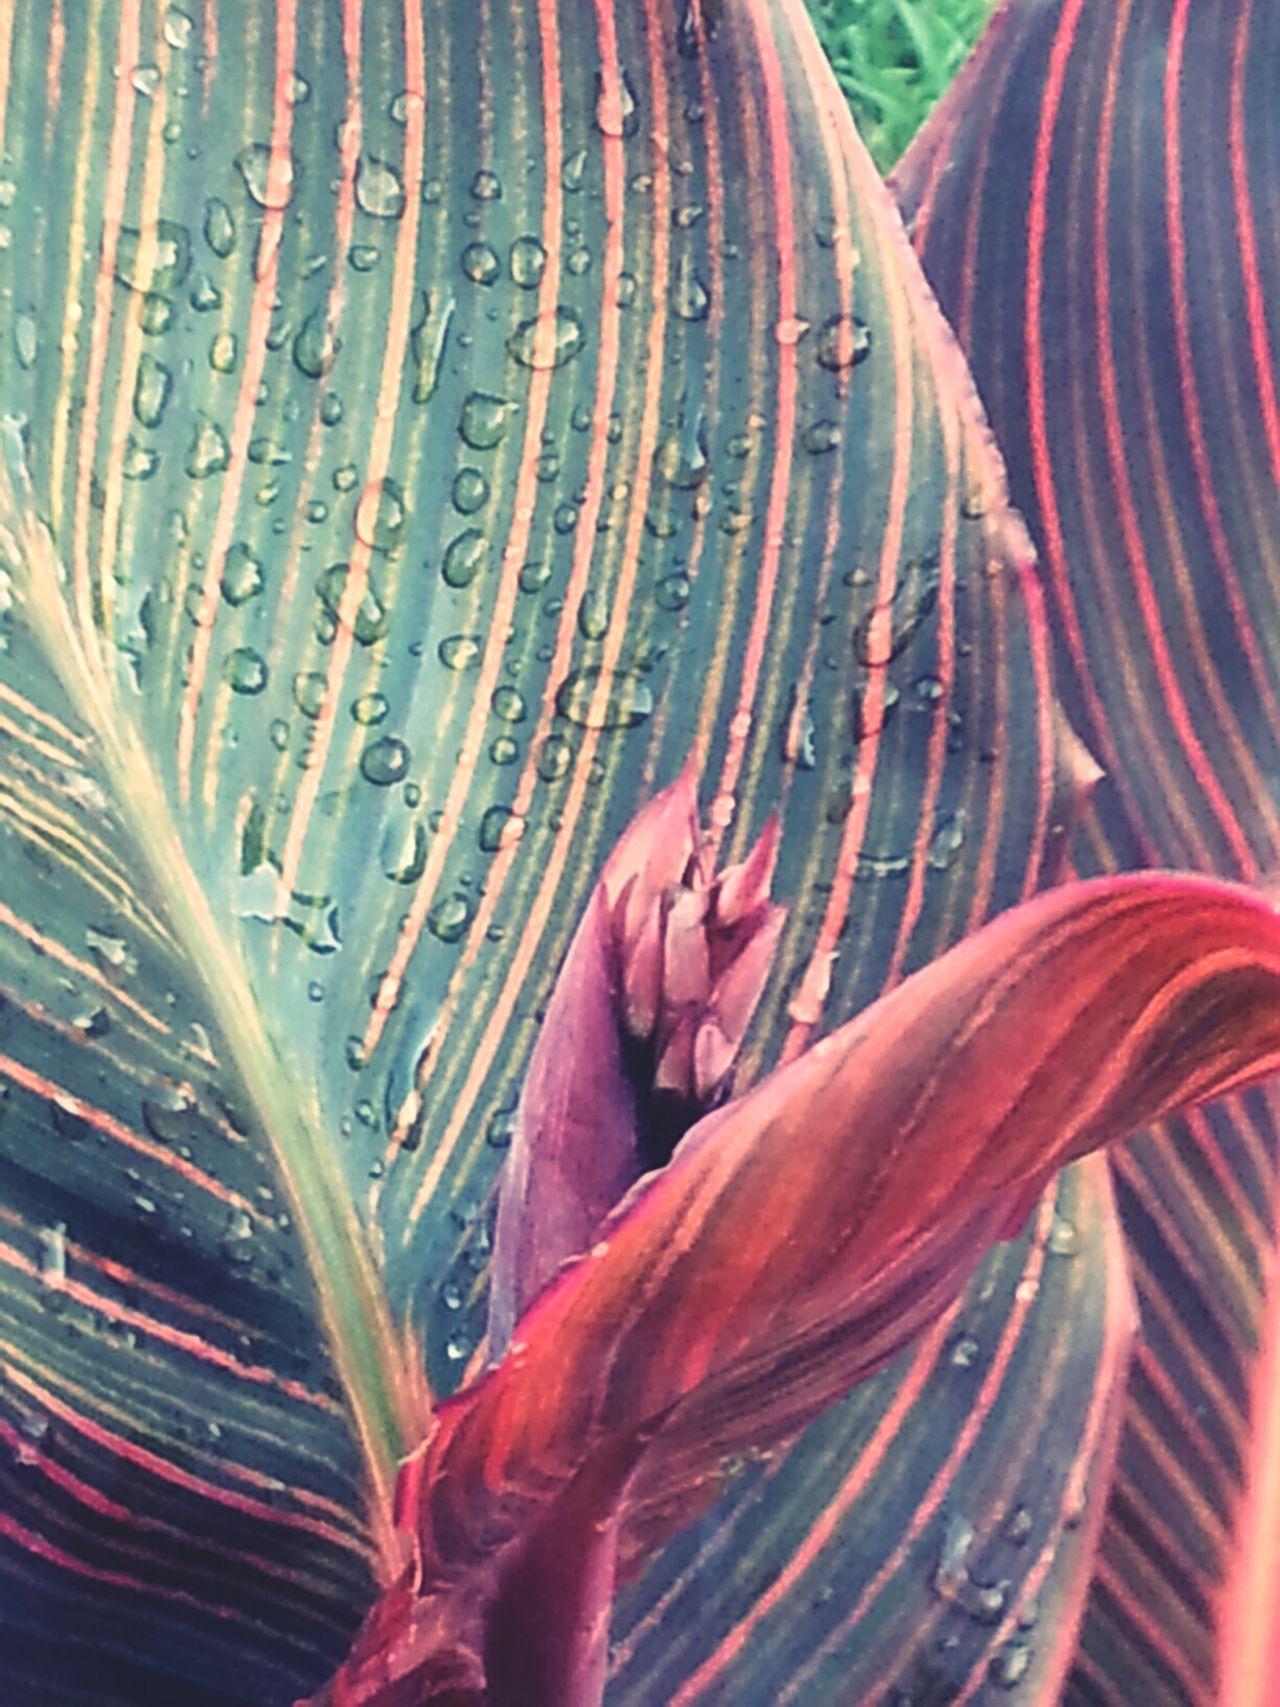 Taking Photos Raindrops Plants Nature